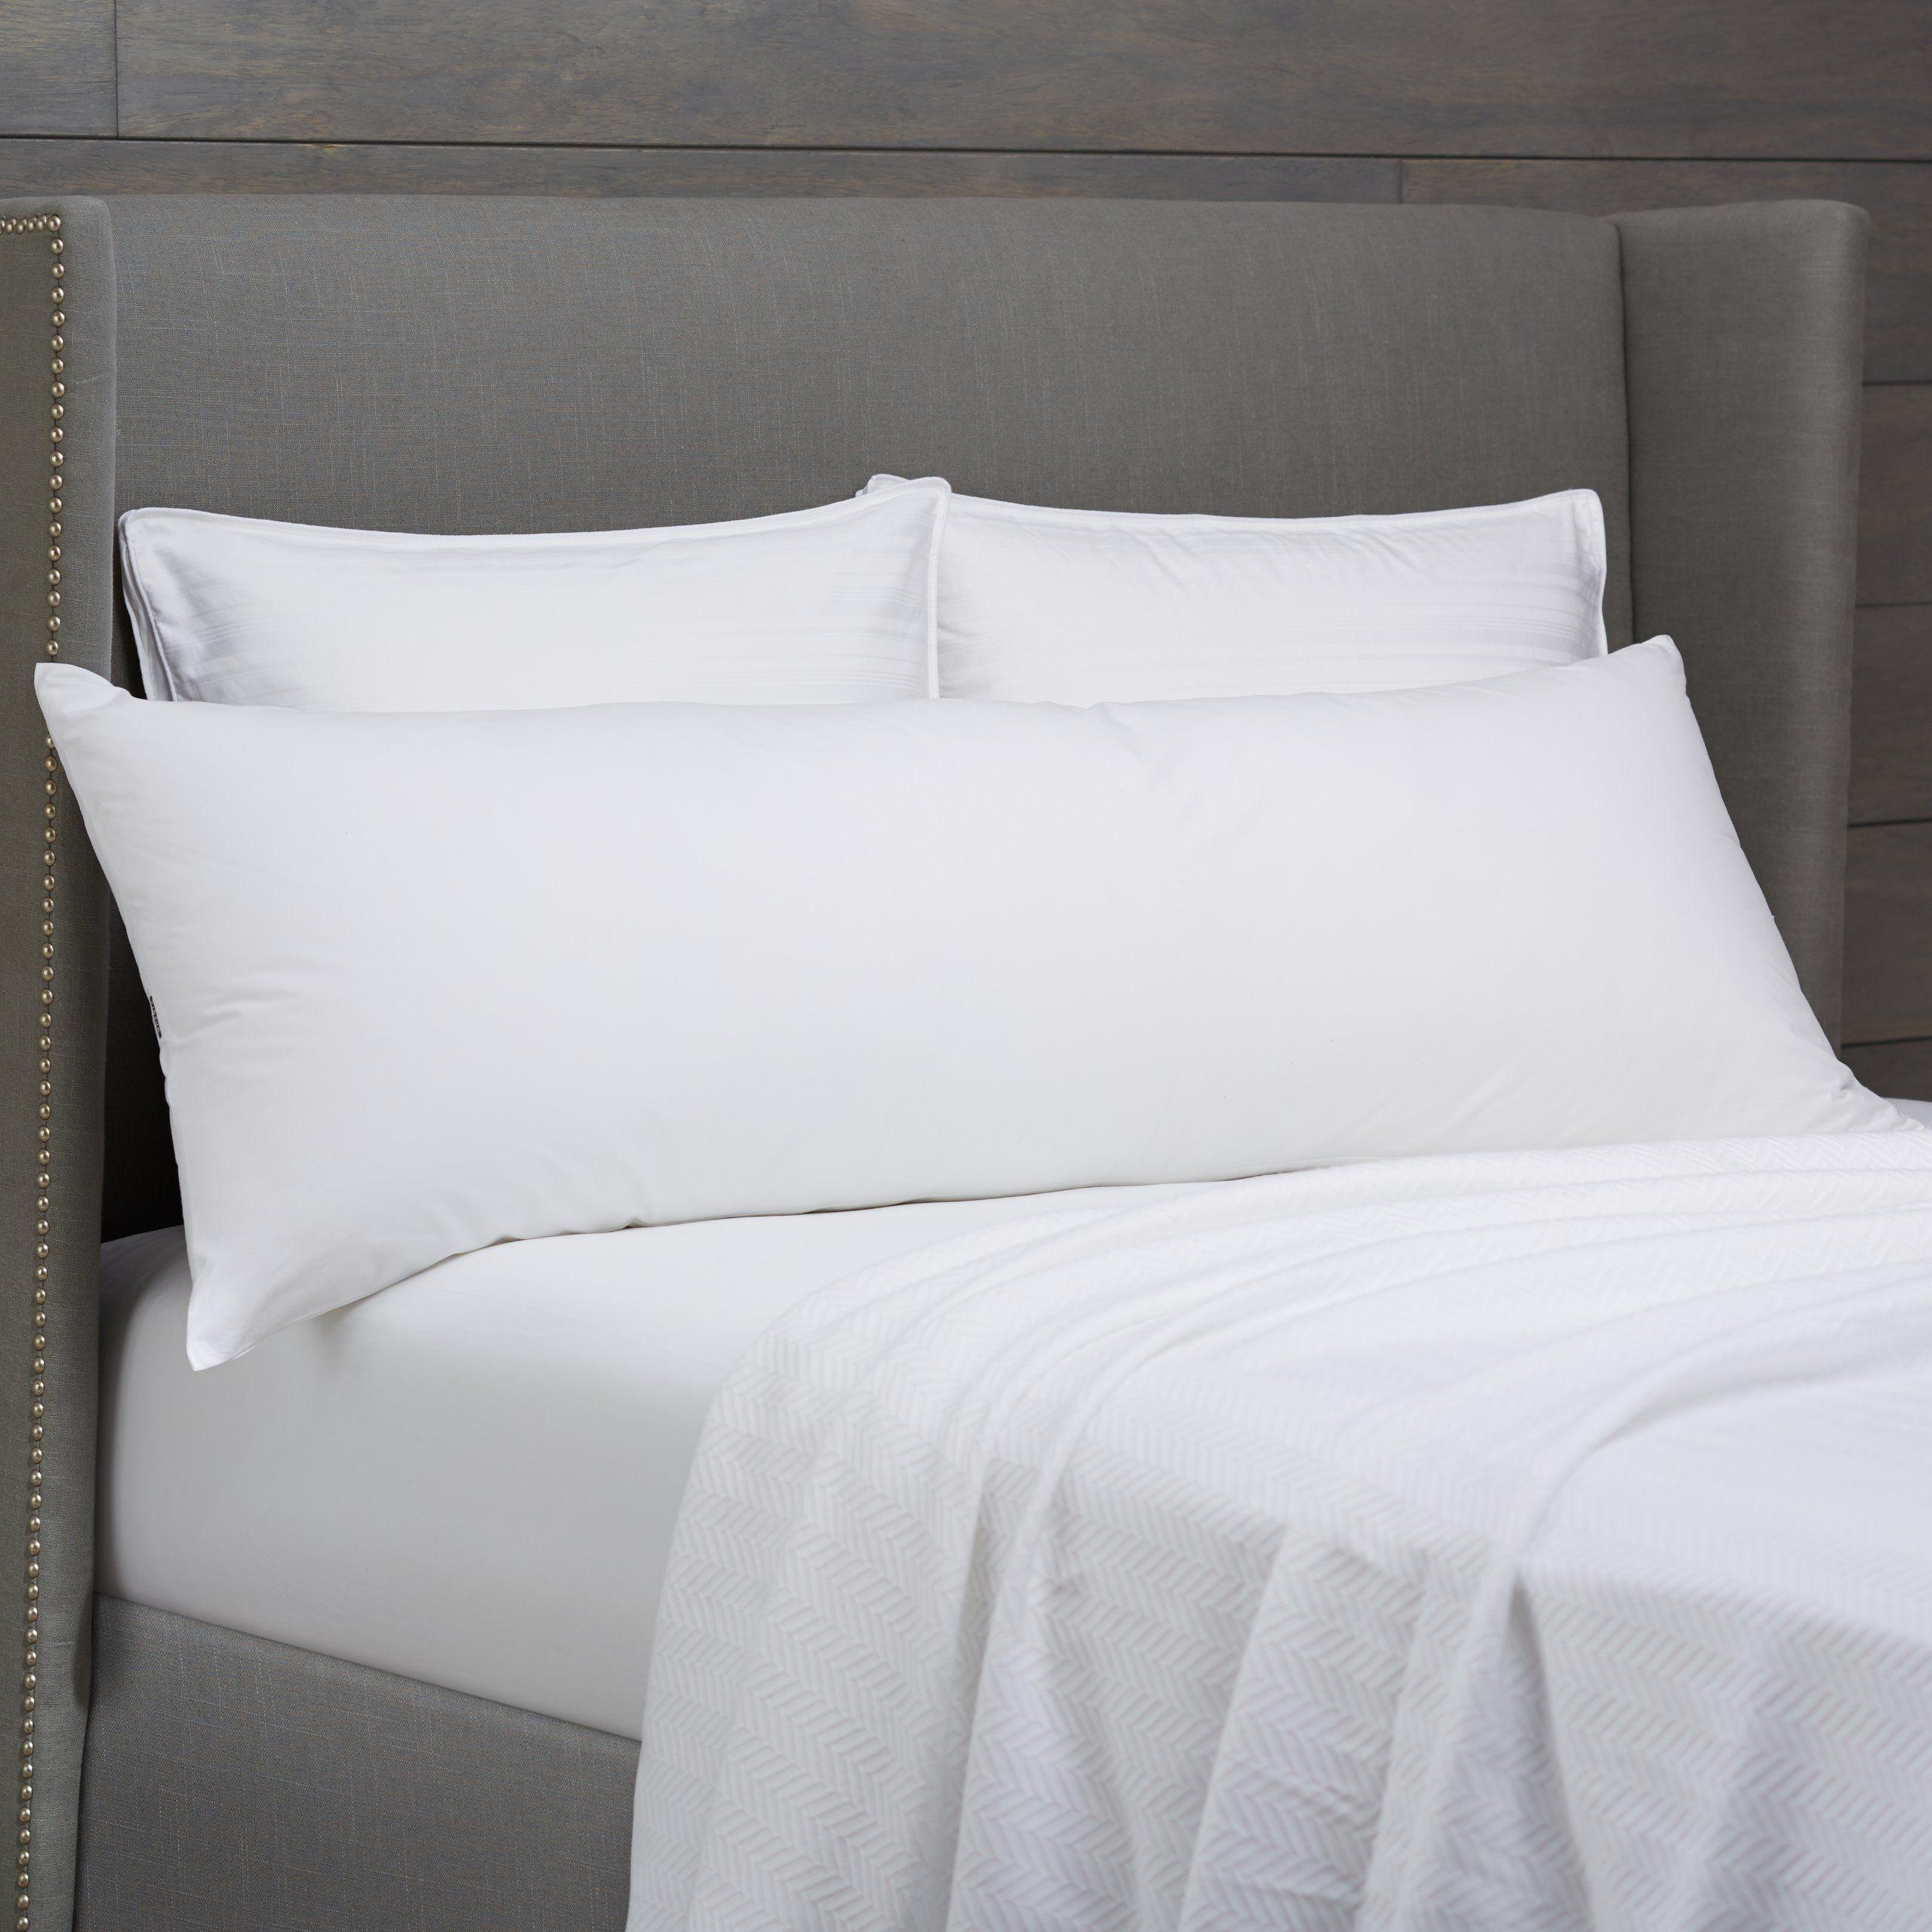 Pinzon Basics Body Pillow With Cover Bed Pillows Body Pillow